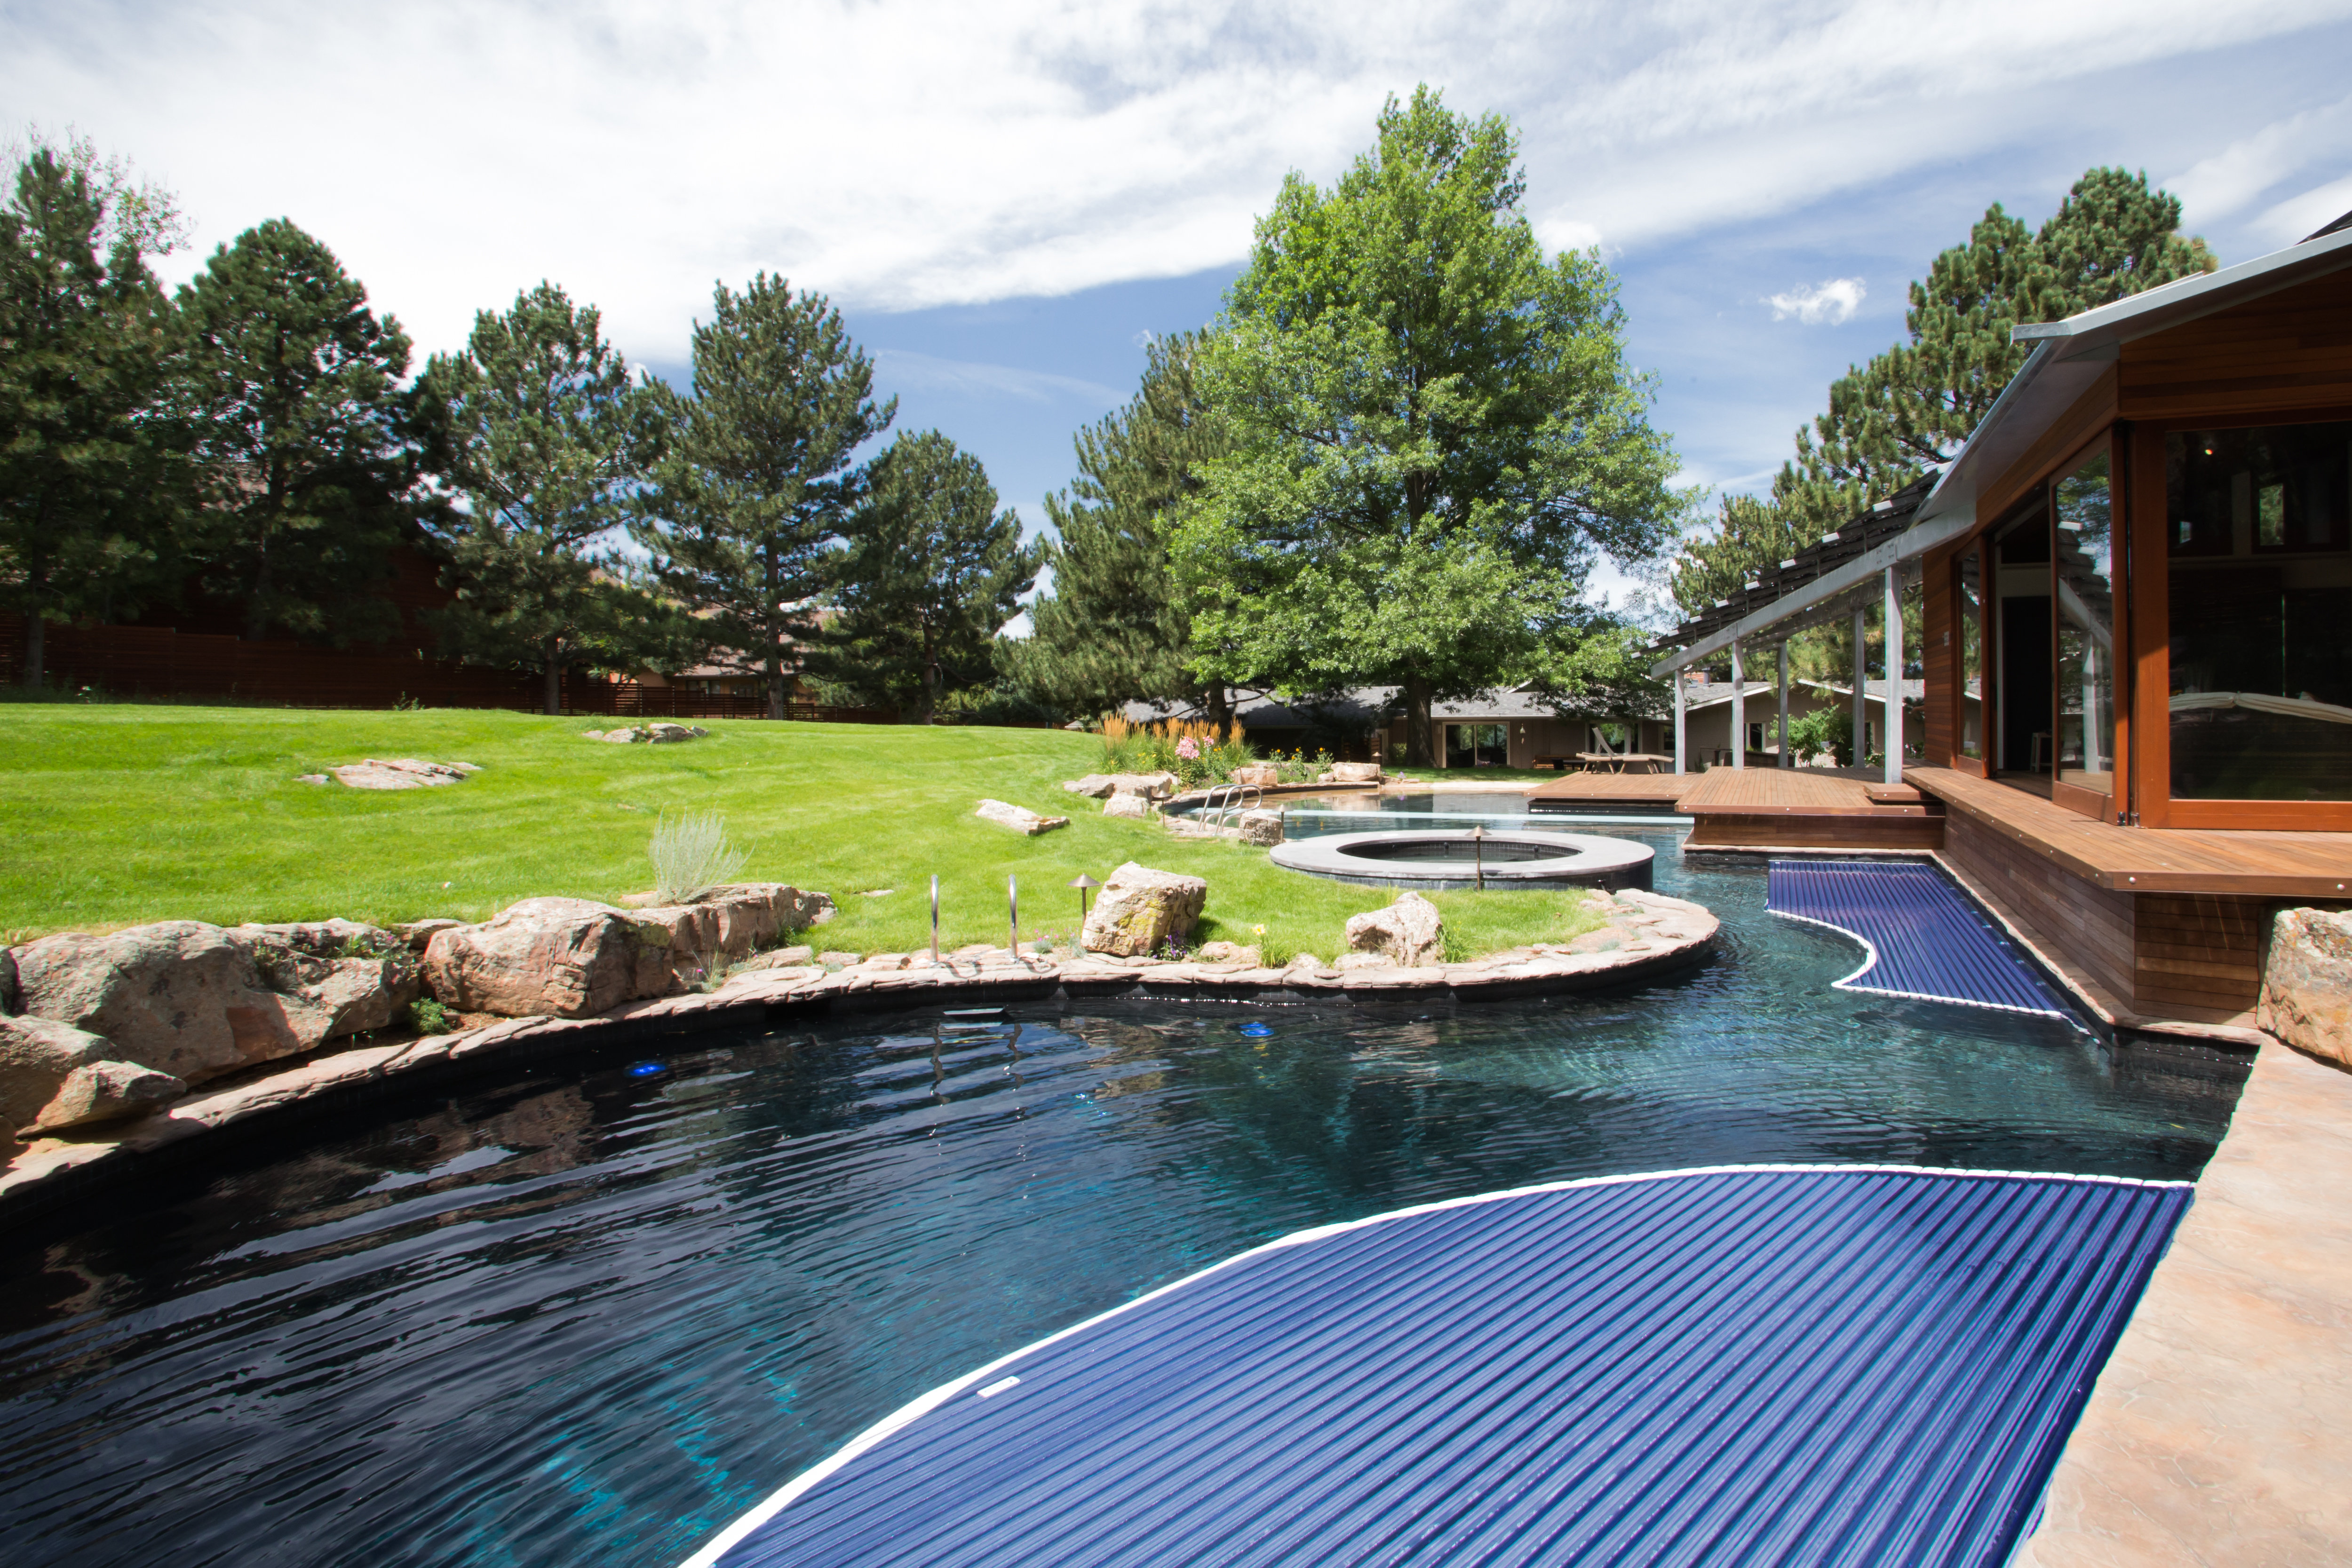 Cubierta de piscina de forma libre de listones rígidos automática Covertech Grando 09